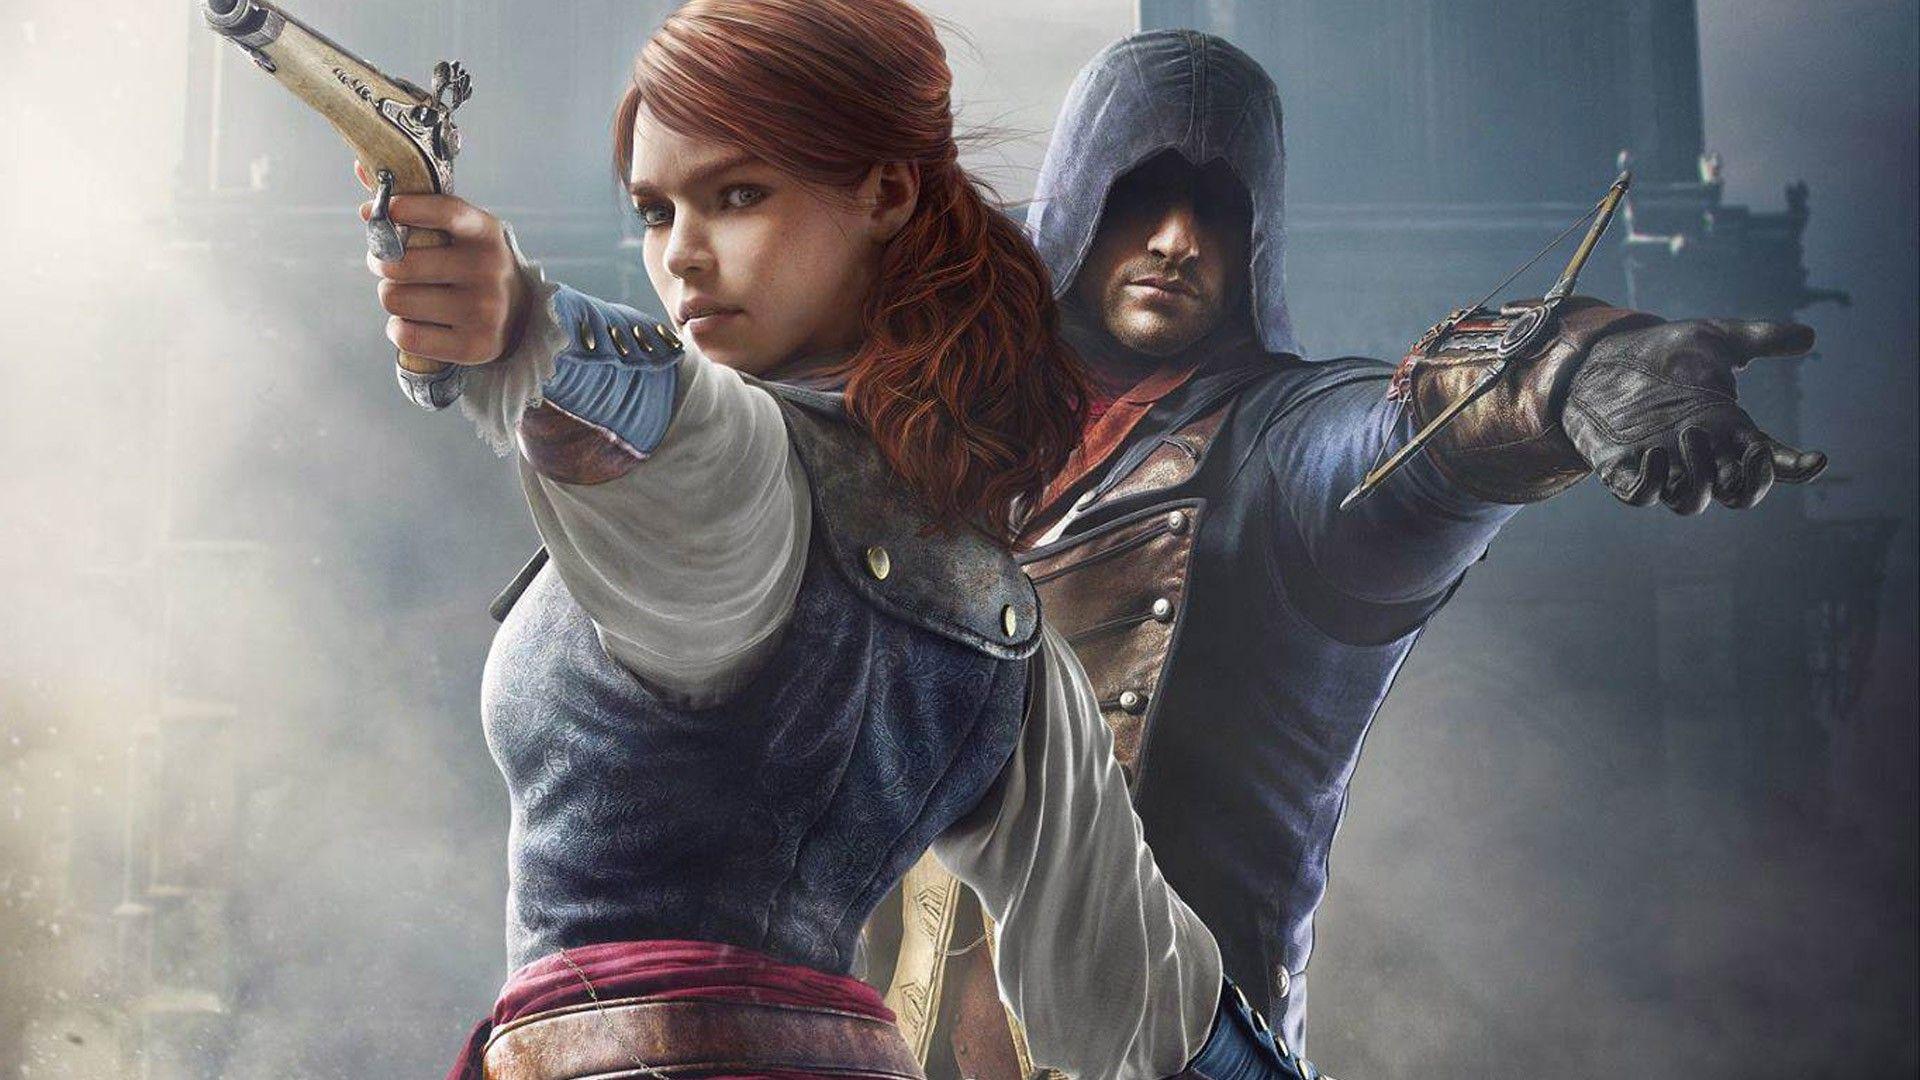 Arno Dorian Assassins Creed Assassins Creed Unity Elise